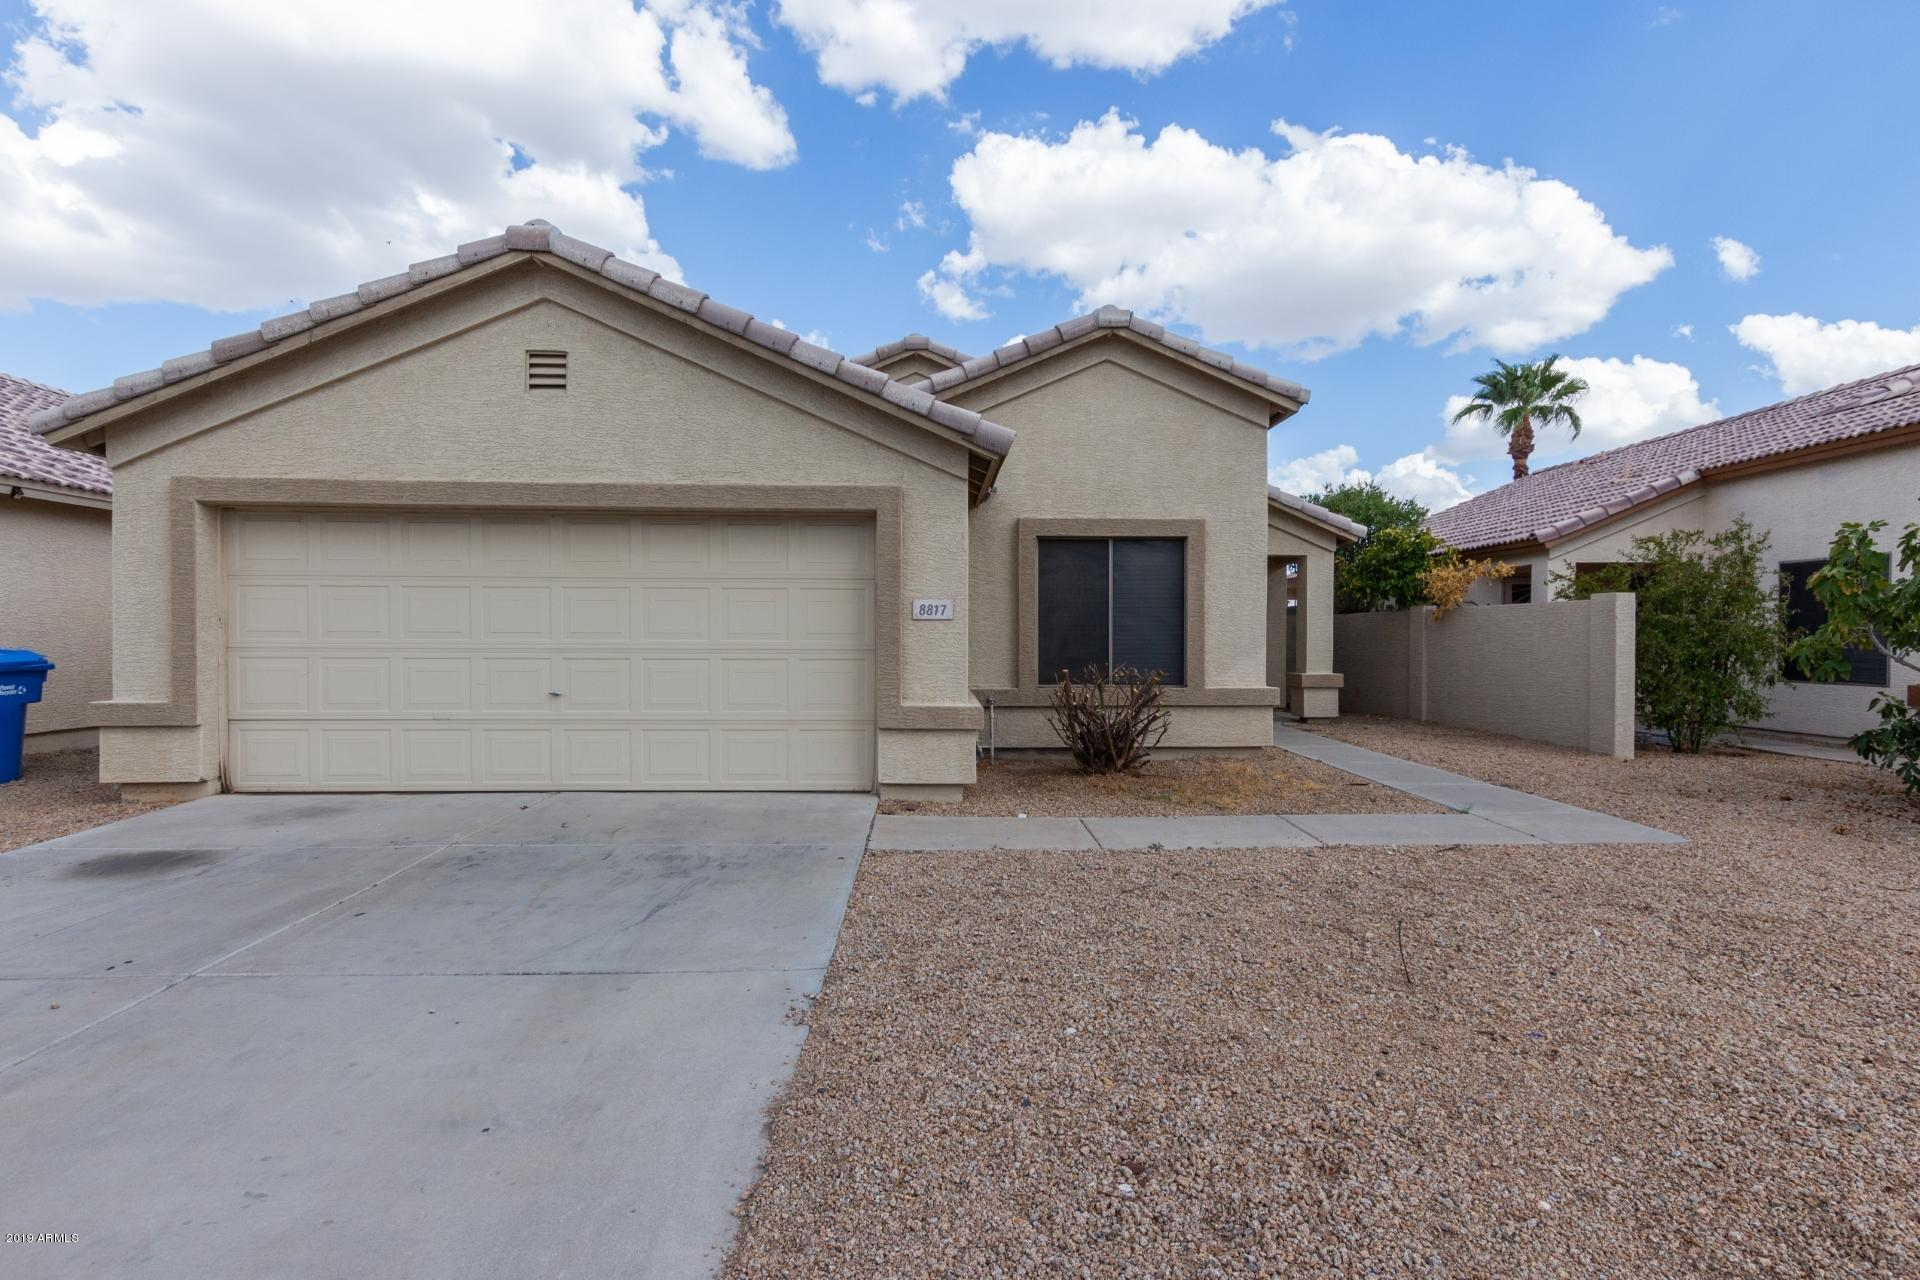 Photo of 8817 N 20TH Avenue, Phoenix, AZ 85021